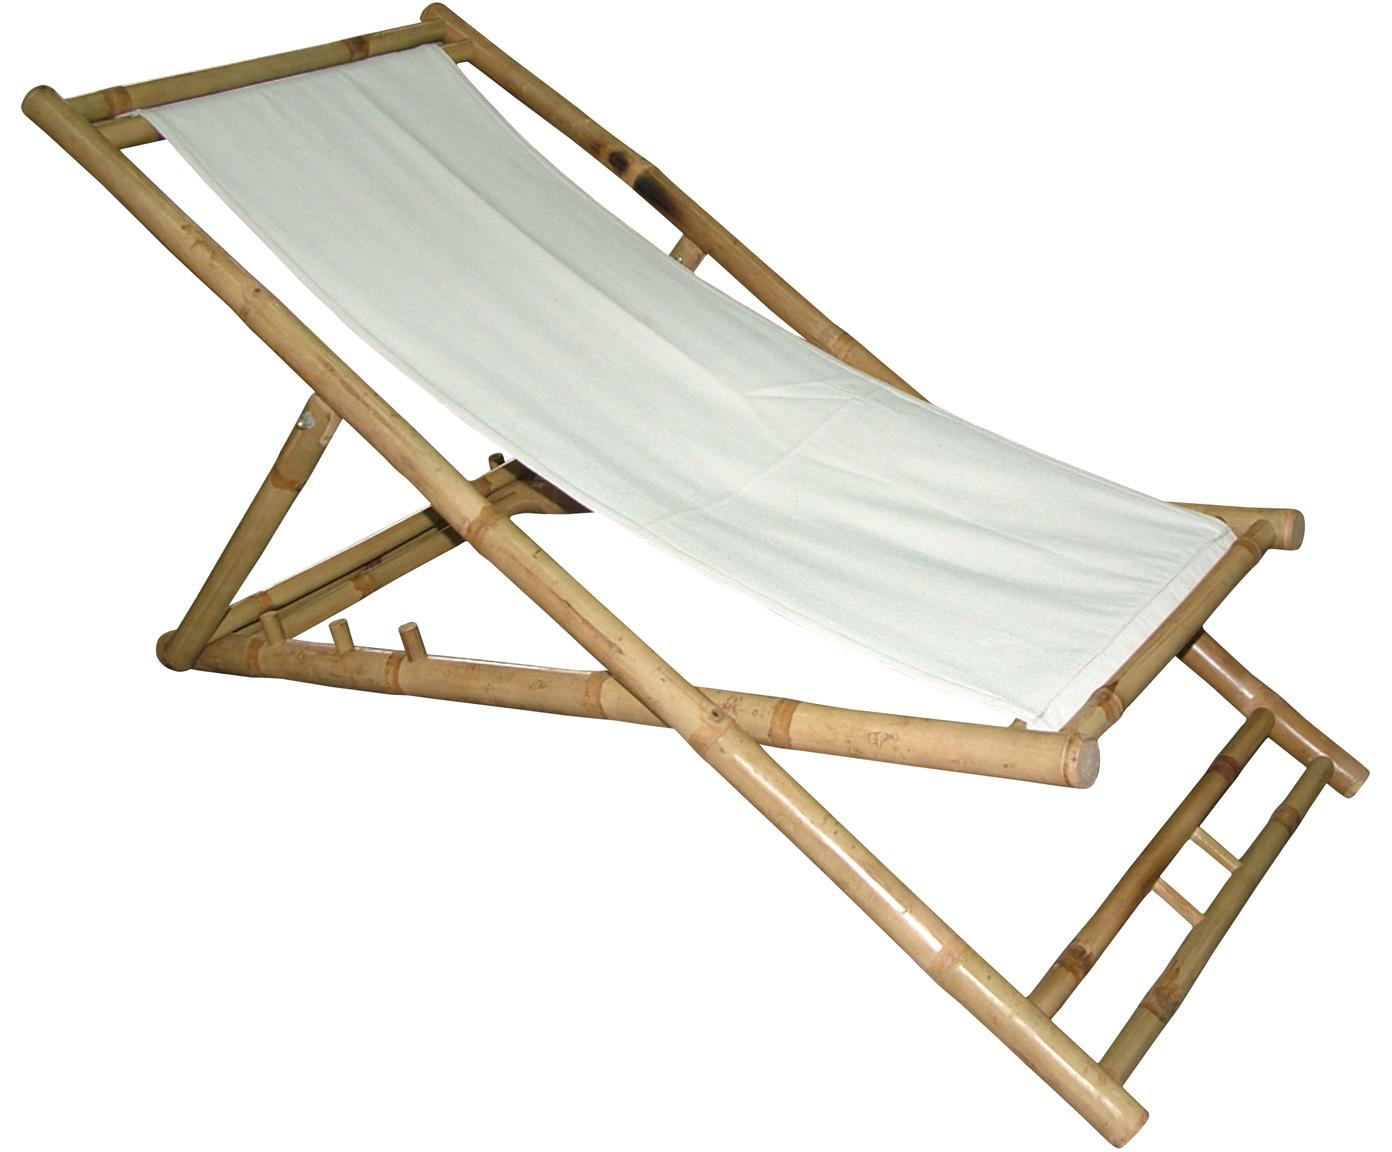 Sedia a sdraio pieghevole in bambù Bammina, Bambù, tessuto, Bianco, Larg. 60 x Alt. 80 cm